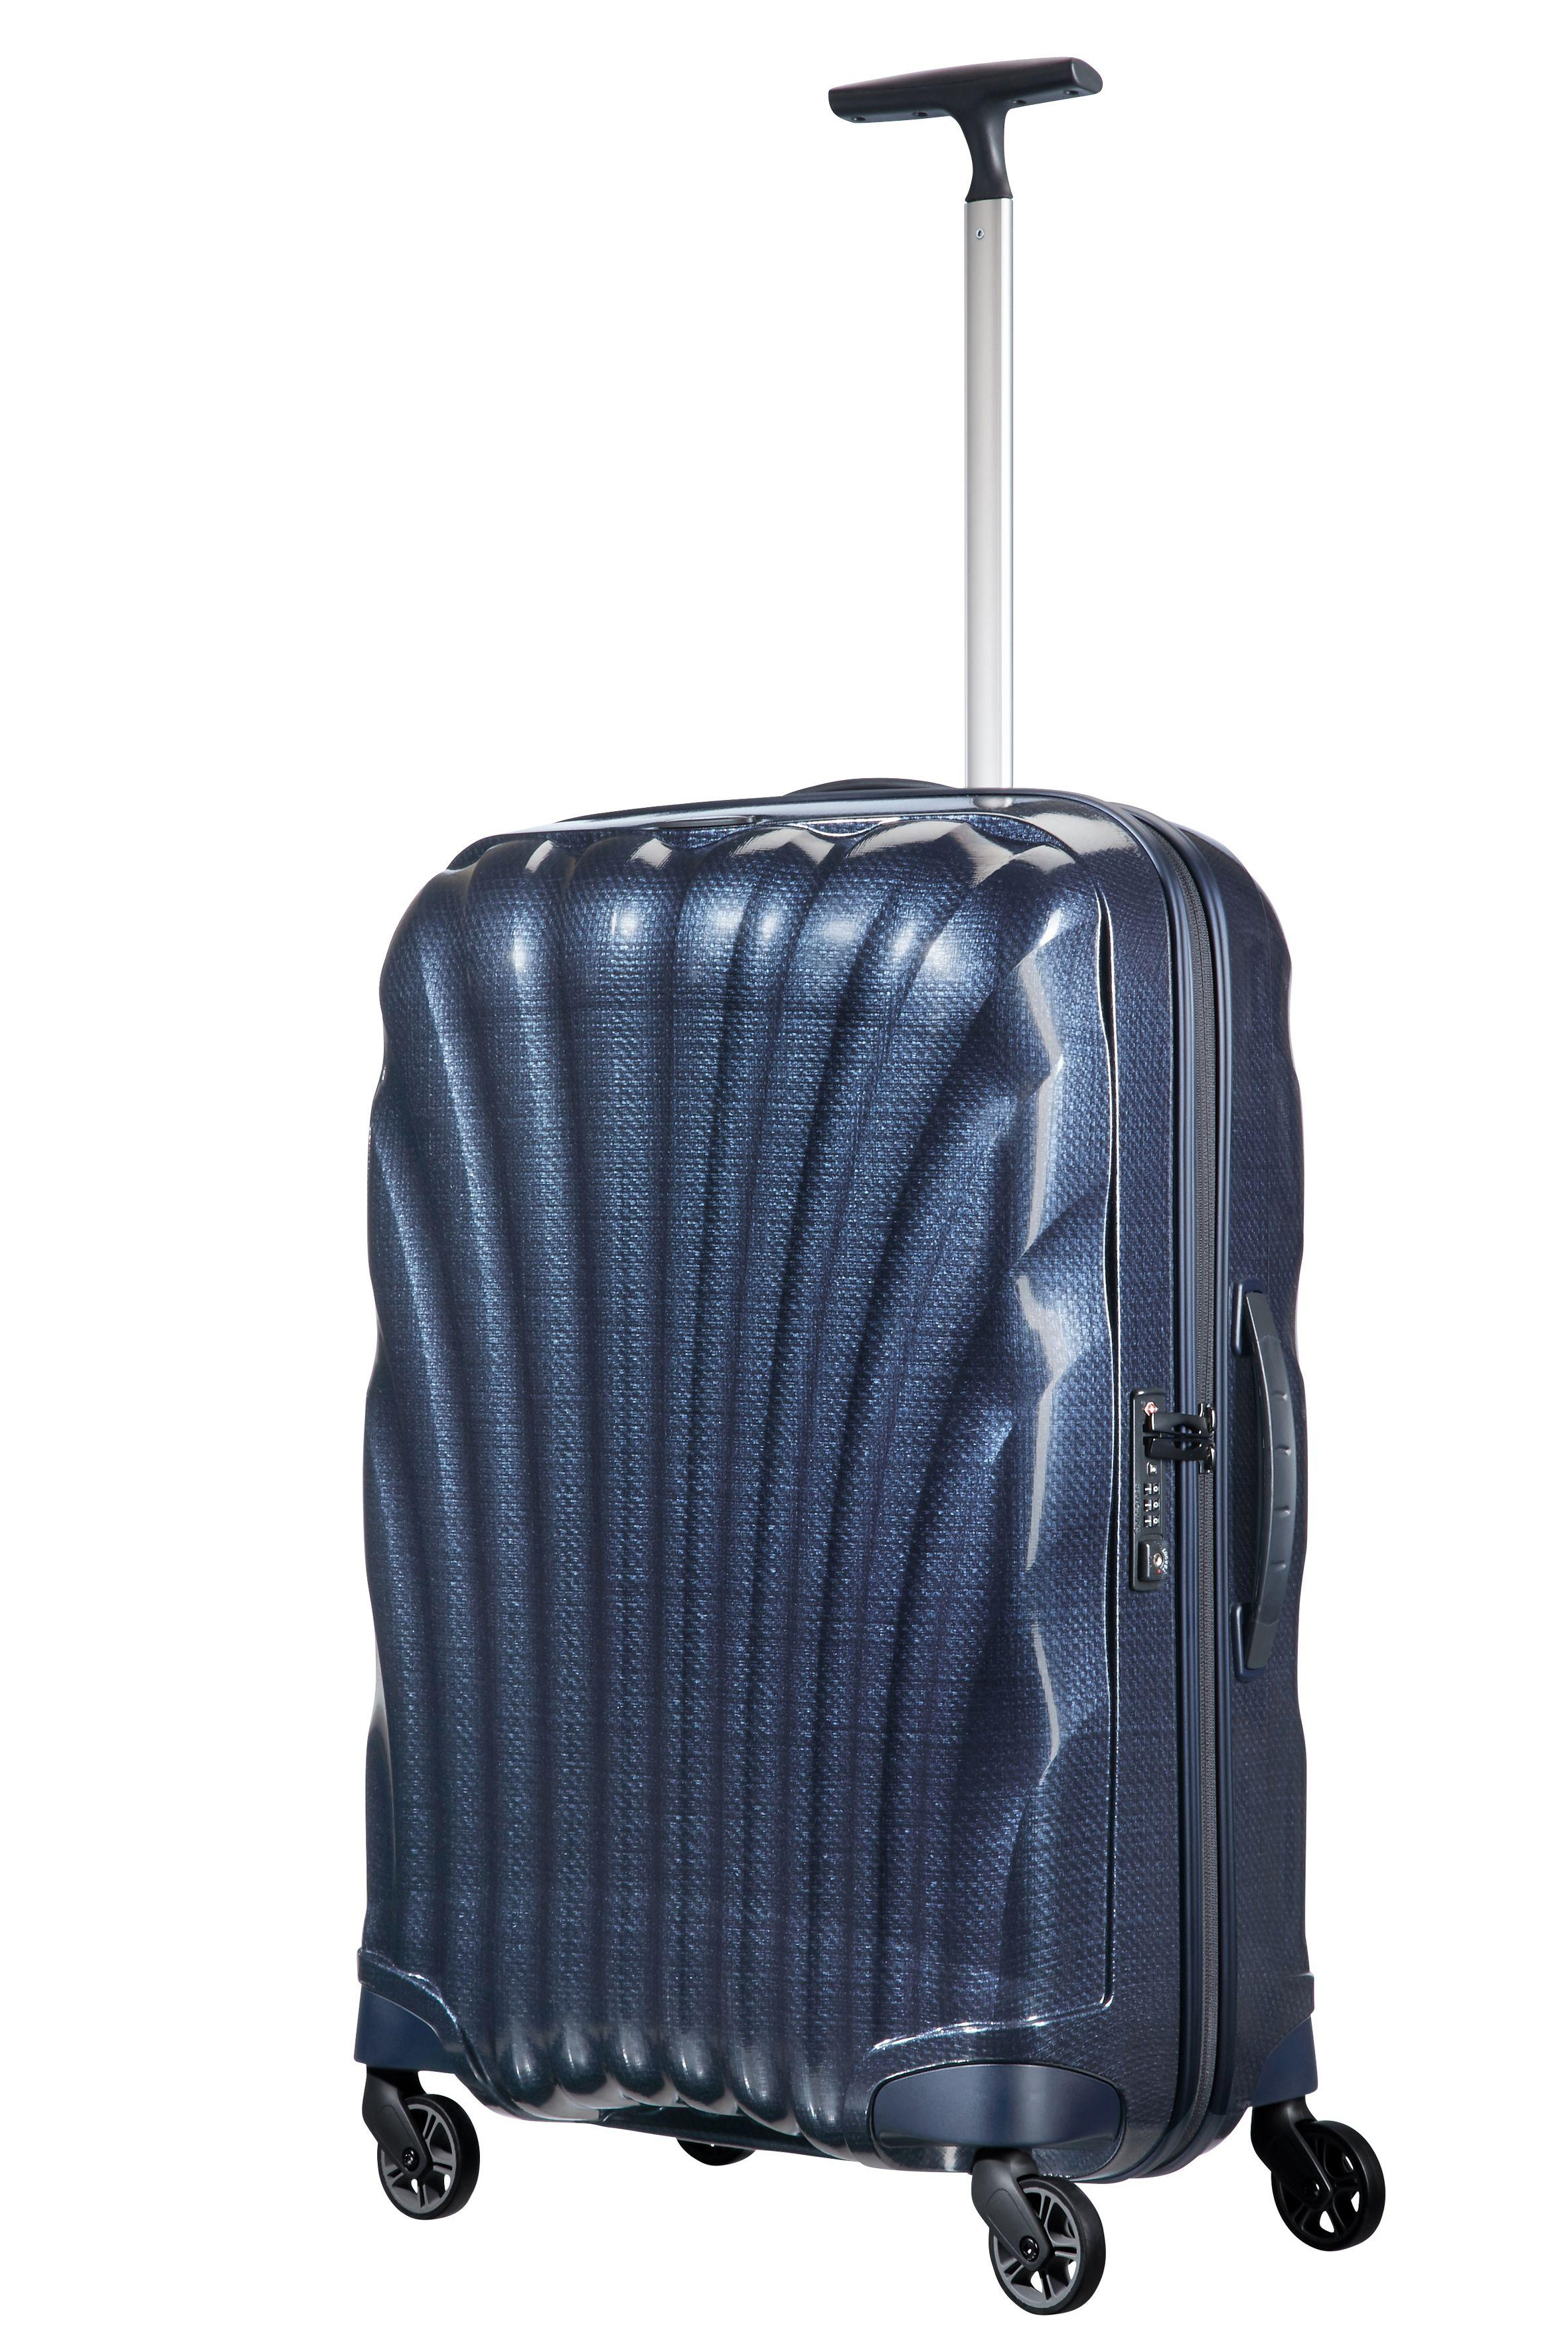 samsonite cosmolite 3 0 navy 4 wheel 69cm medium suitcase in blue lyst. Black Bedroom Furniture Sets. Home Design Ideas